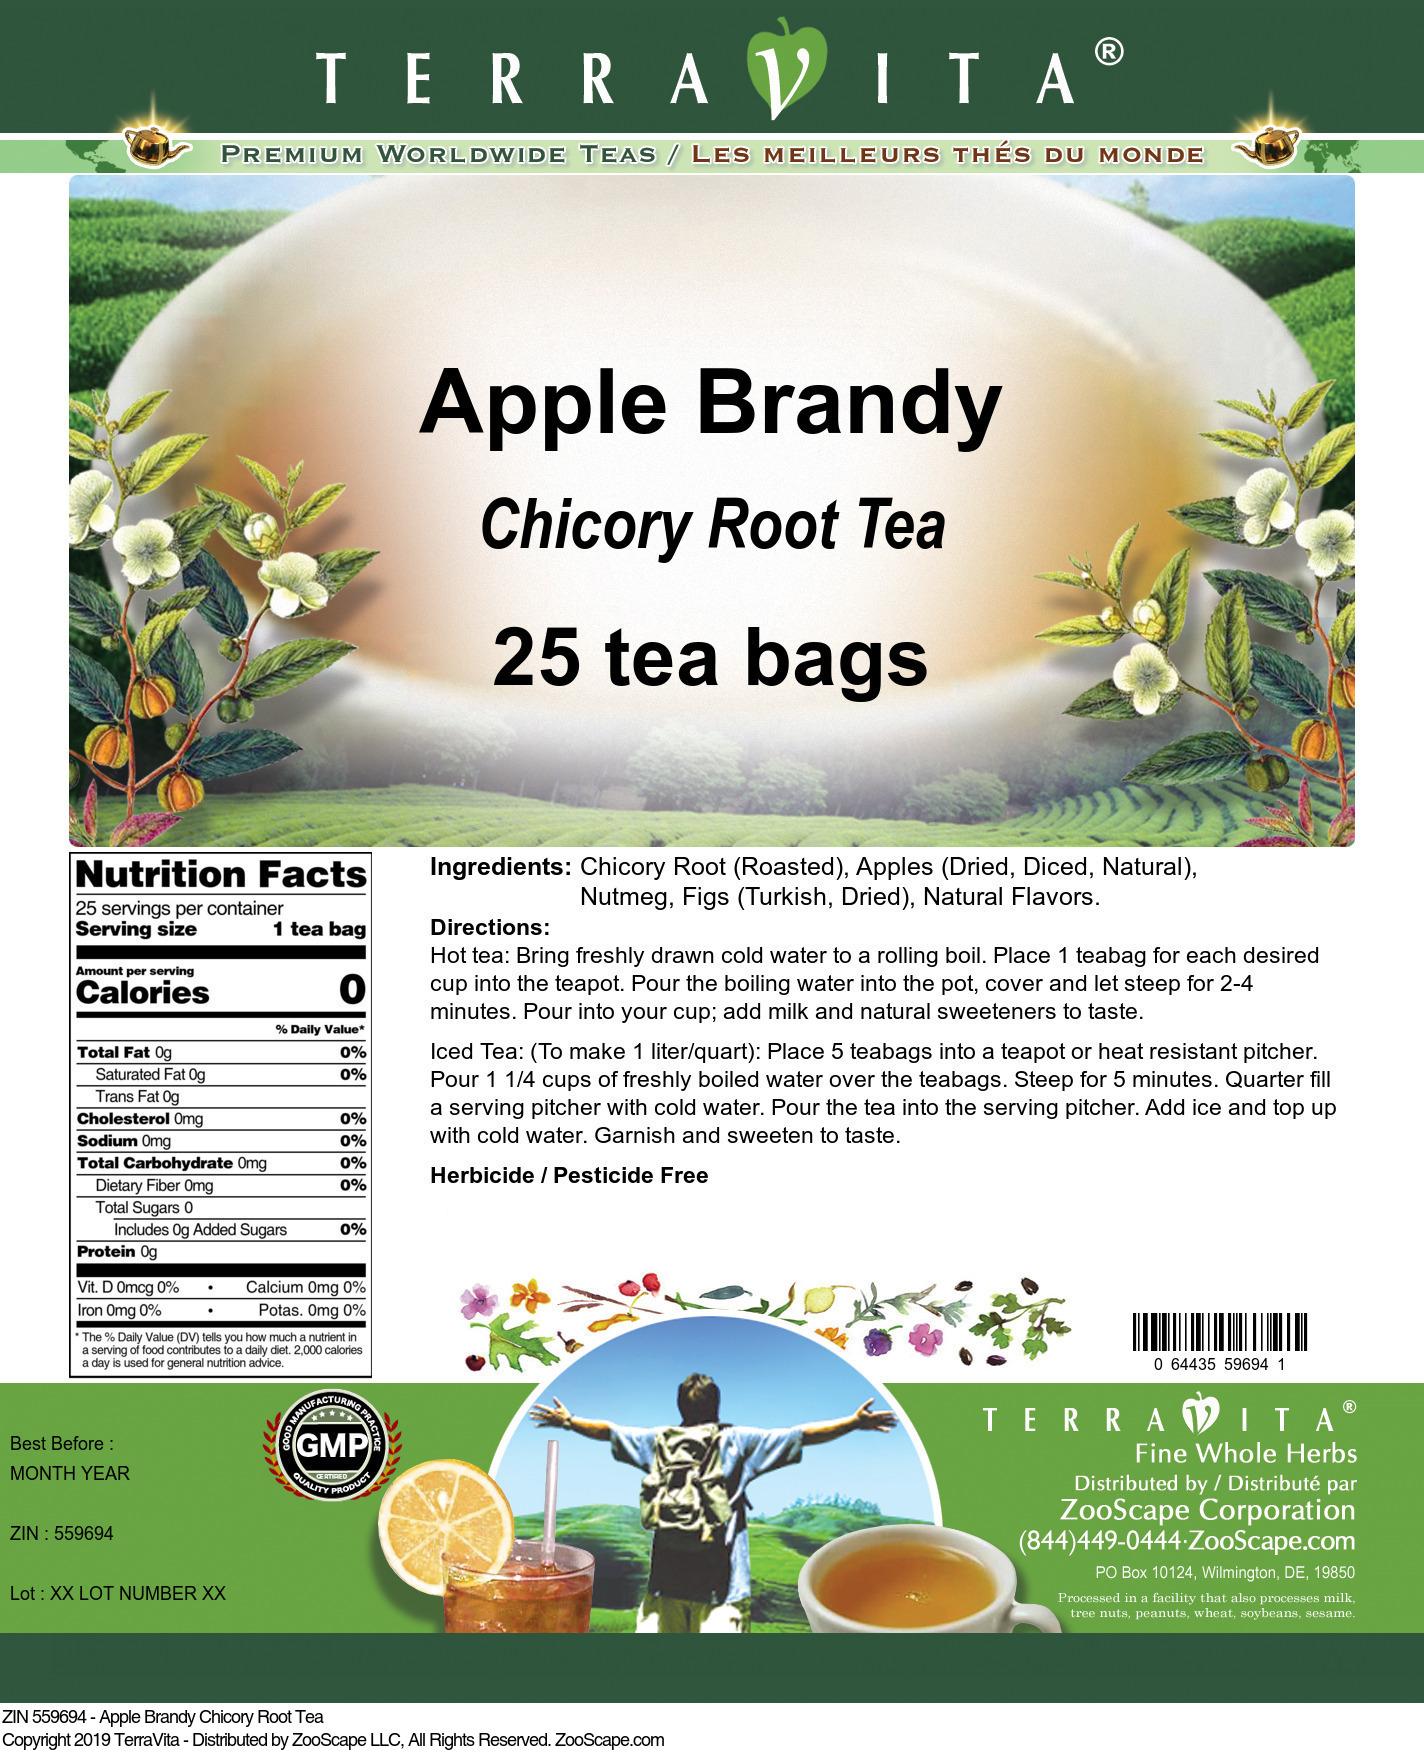 Apple Brandy Chicory Root Tea